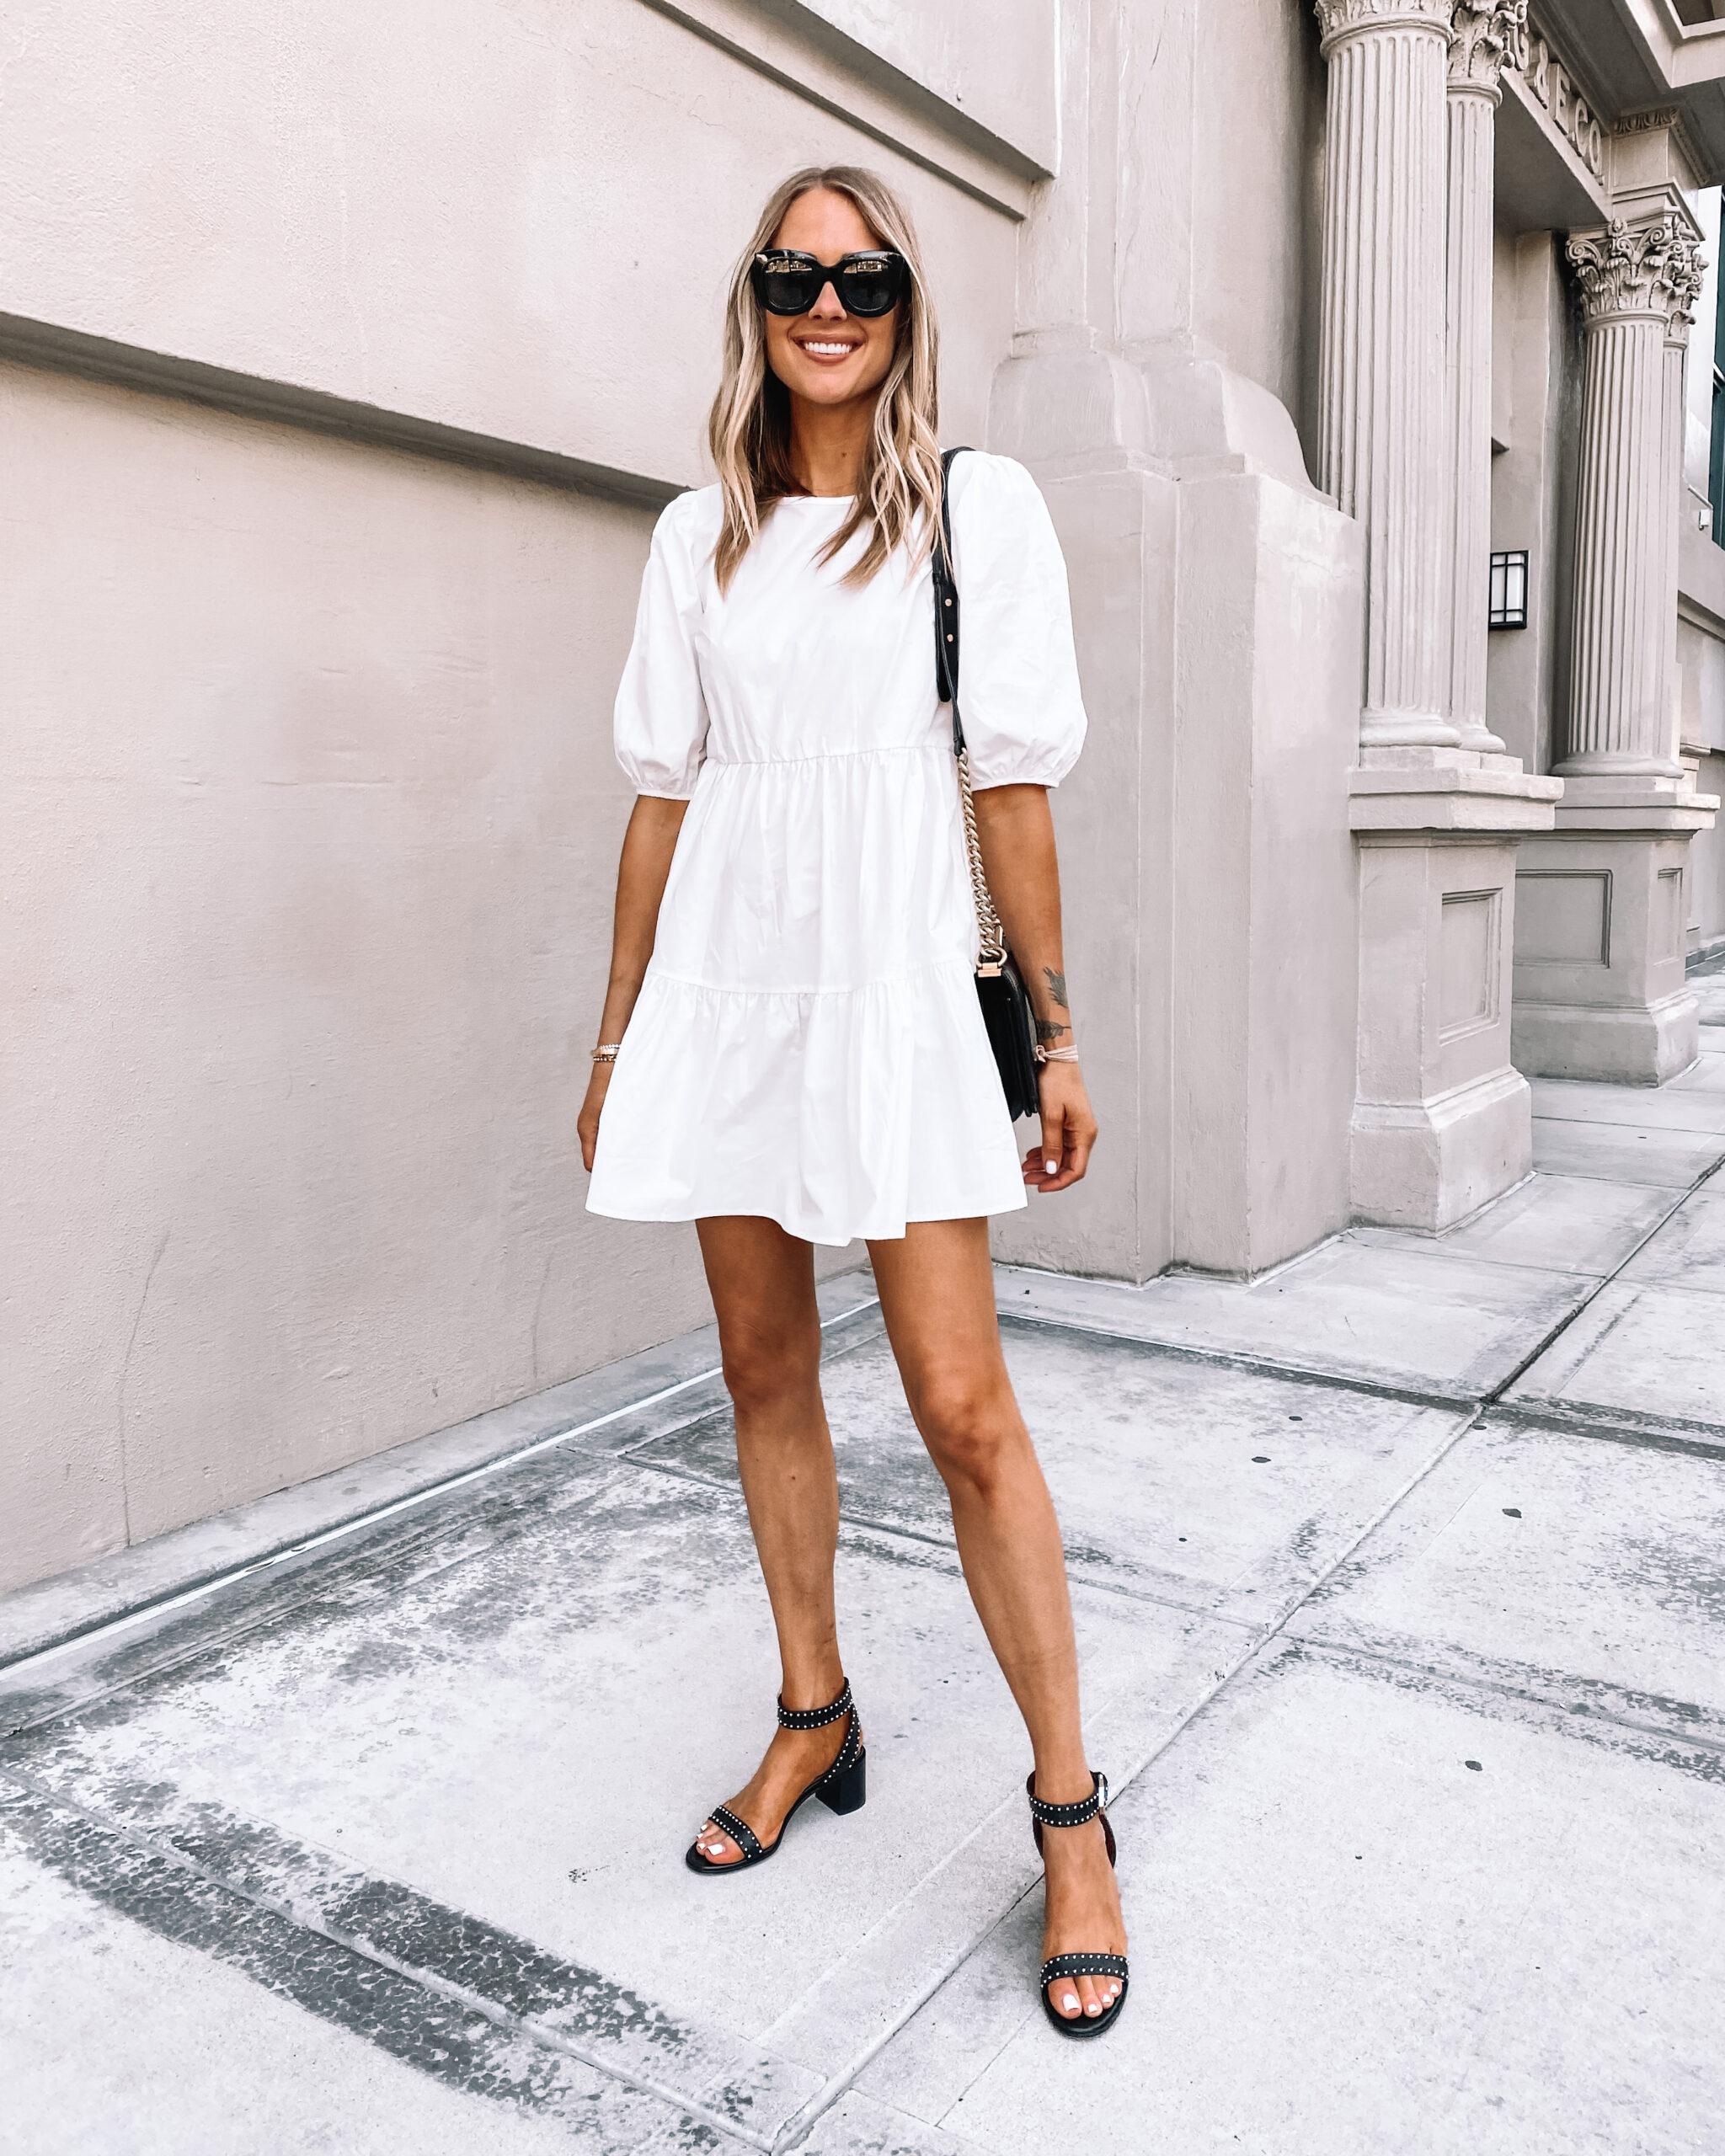 Fashion Jackson Wearing White Puff Sleeve Dress Black Sandals